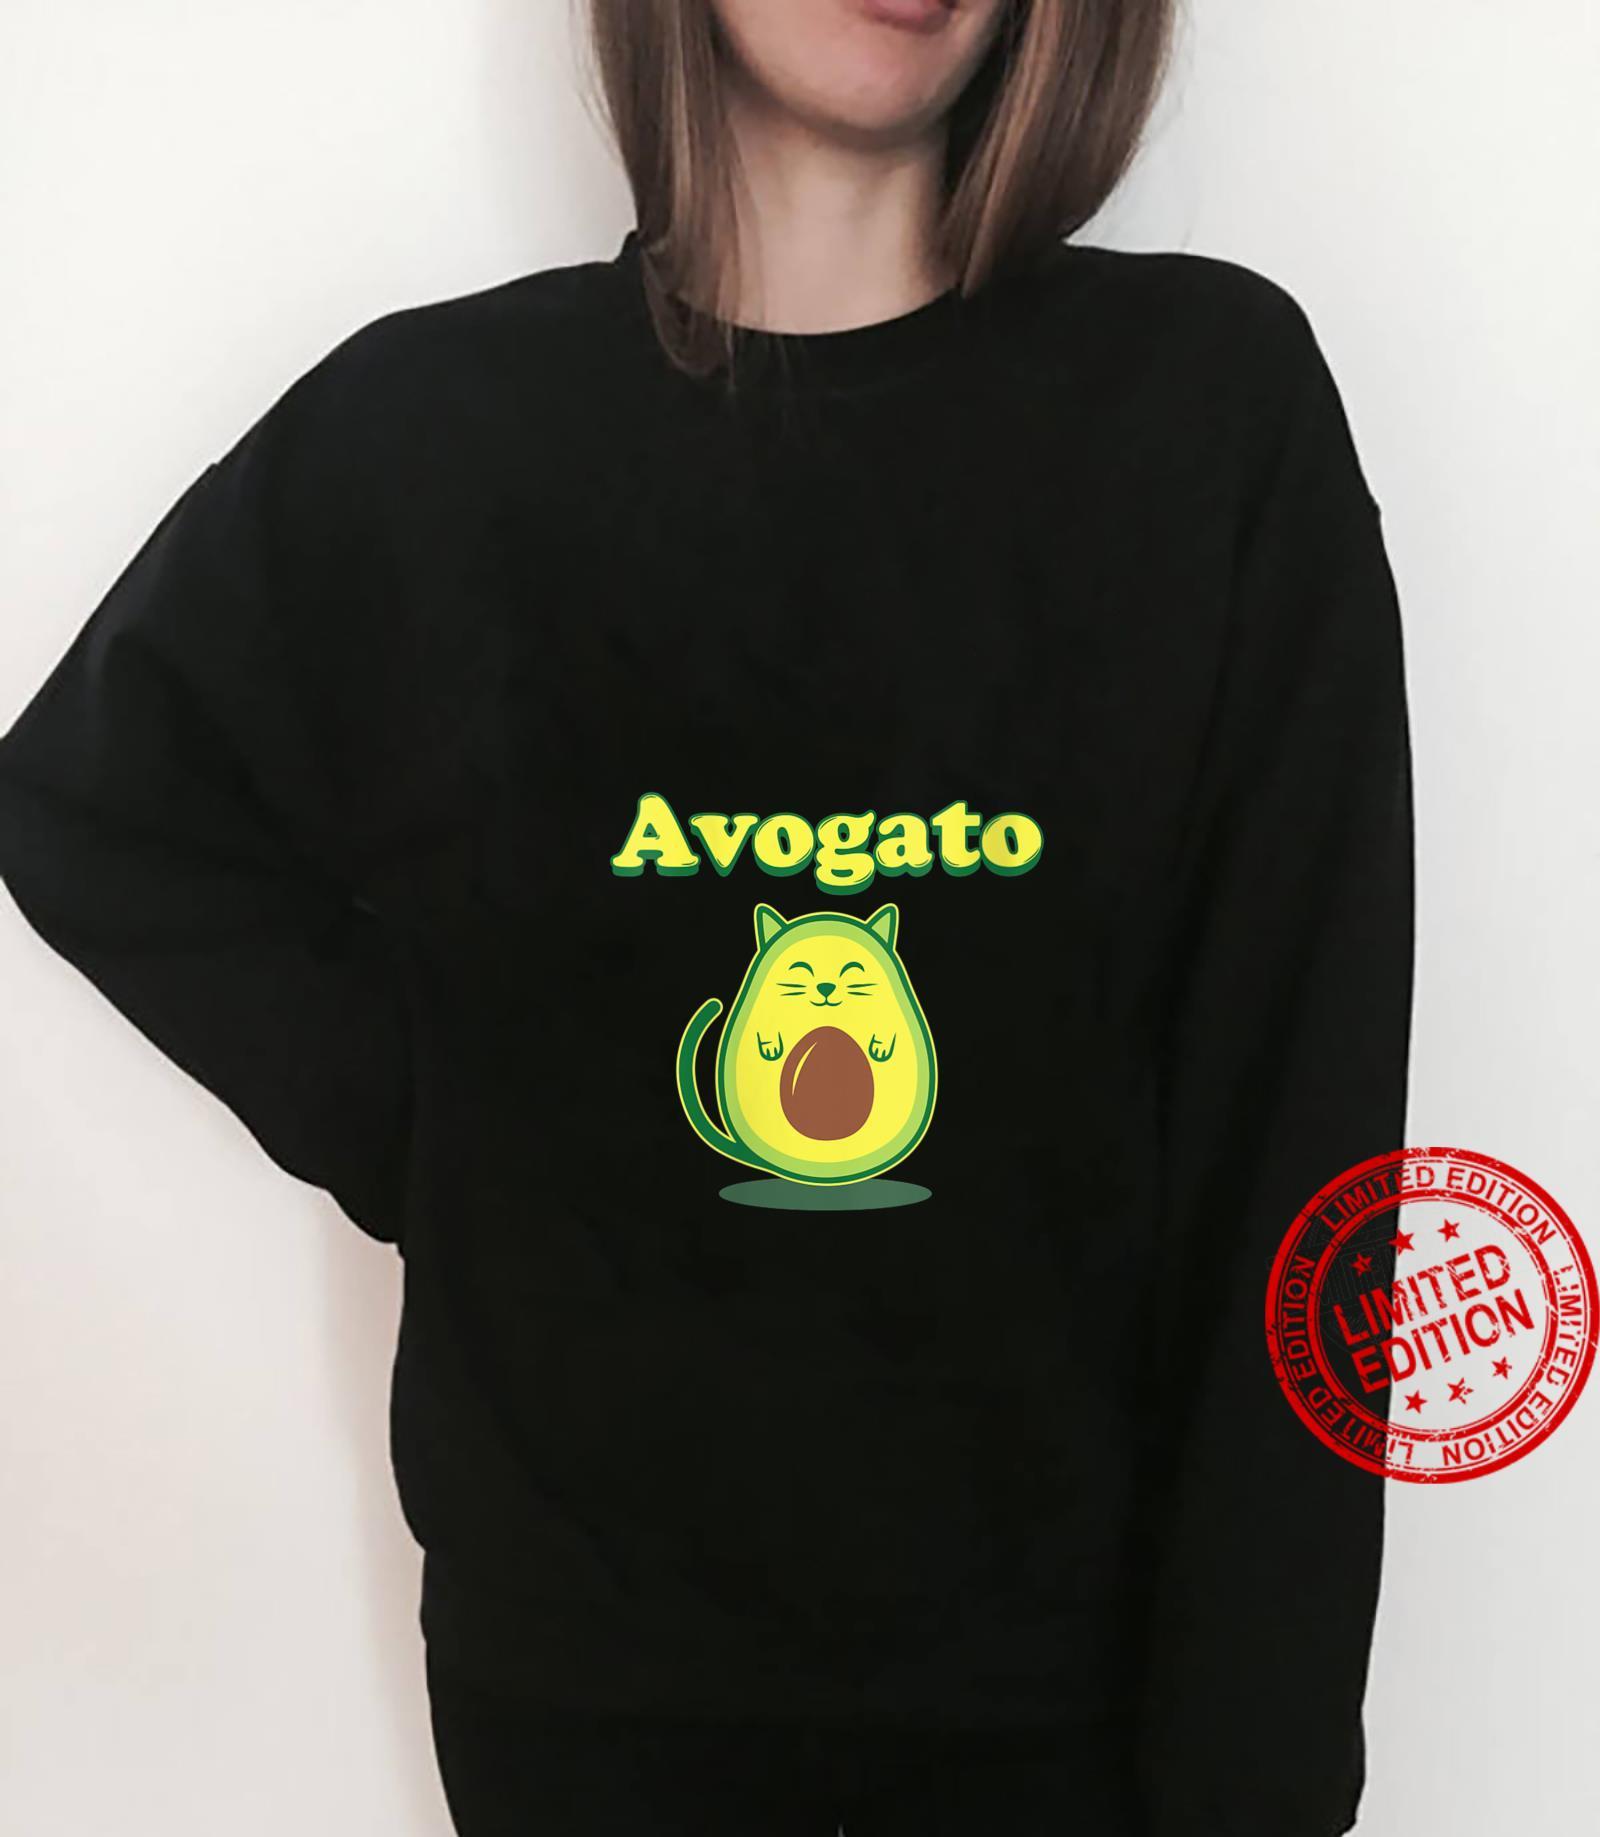 Womens Avocato Cat Avocado Food Shirt sweater